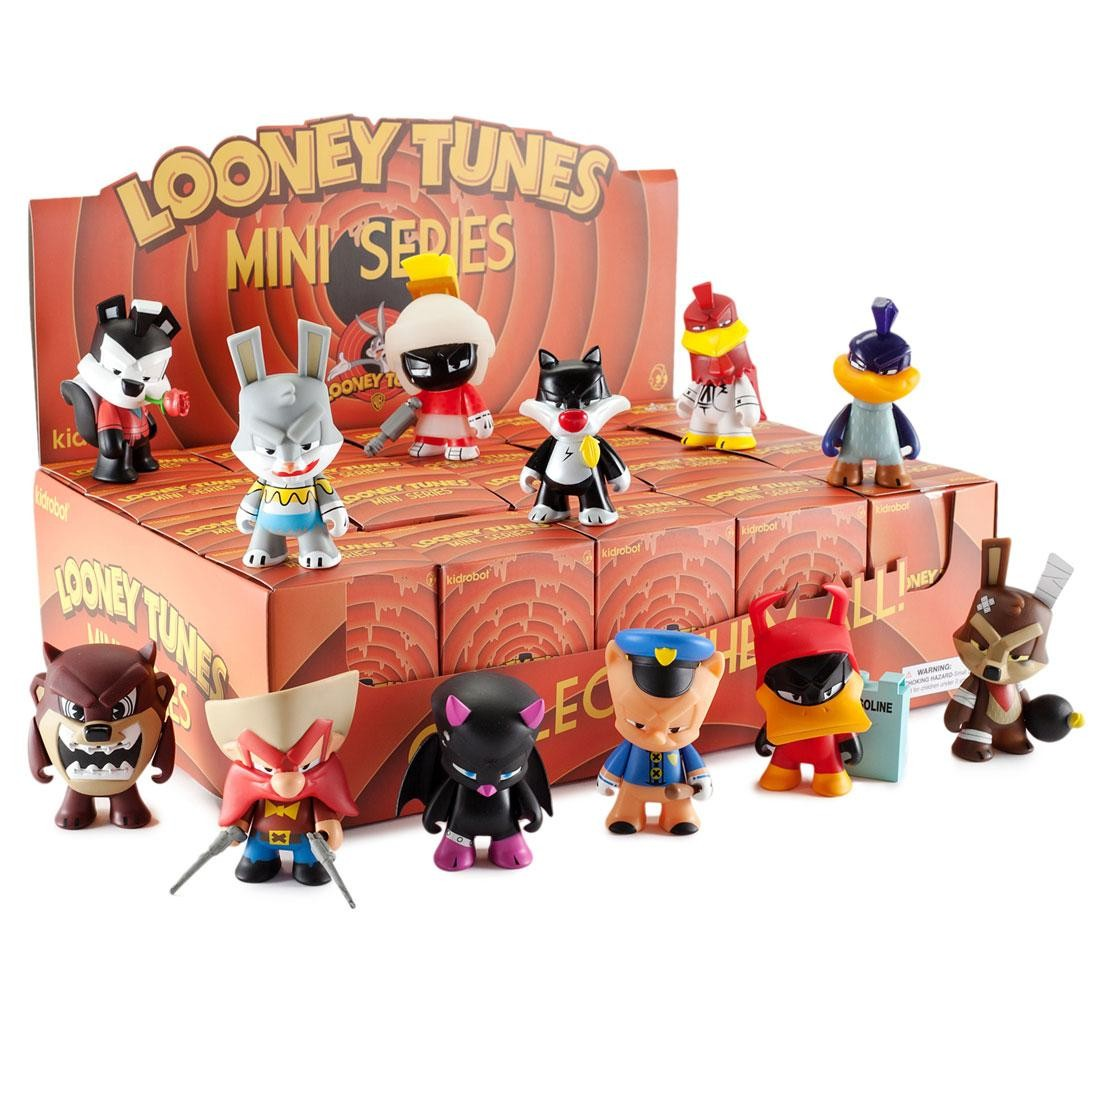 Kidrobot x Warner Bros. Looney Tunes 3in Mini Series Figure - 1 Blind Box